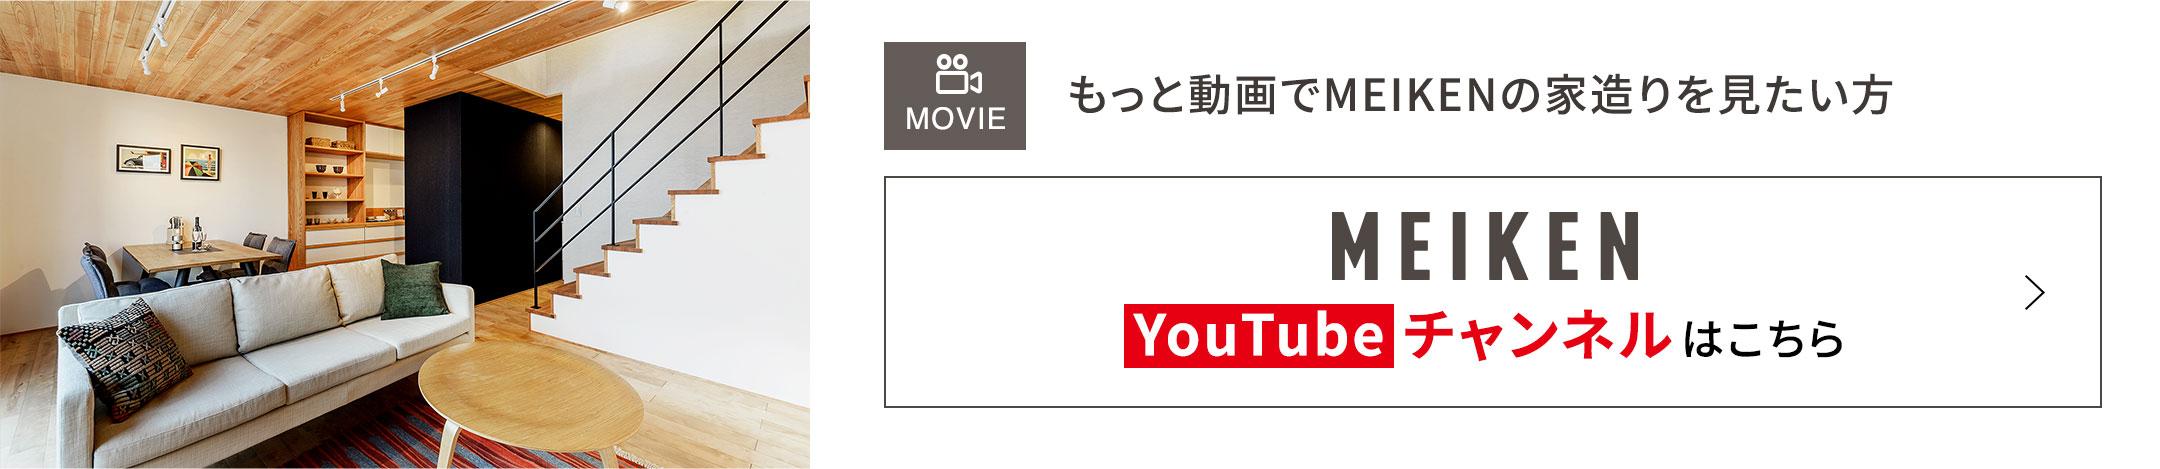 MEIKEN YouTubeチャンネルはこちら